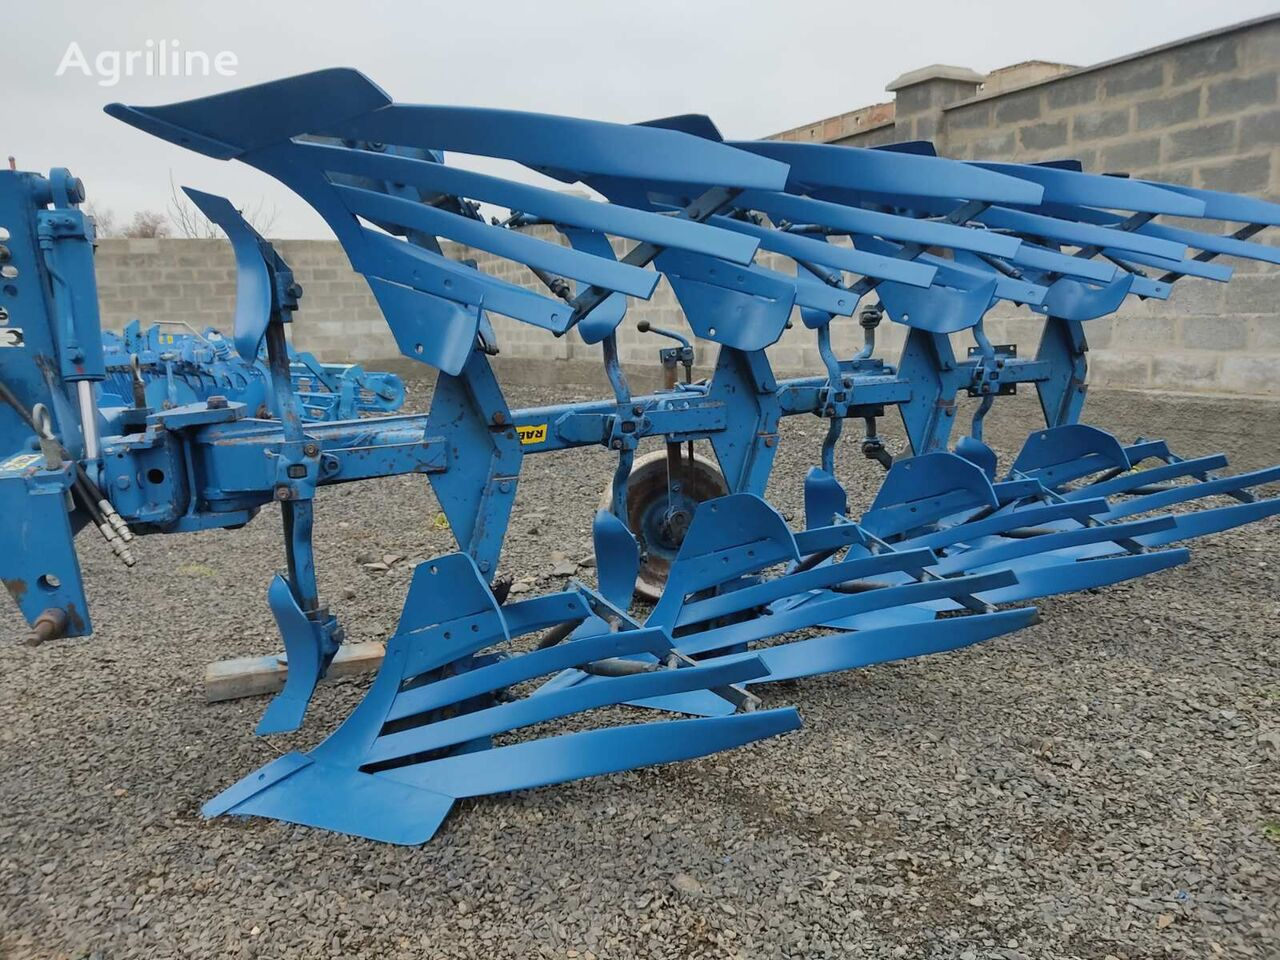 RABE Star reversible plough